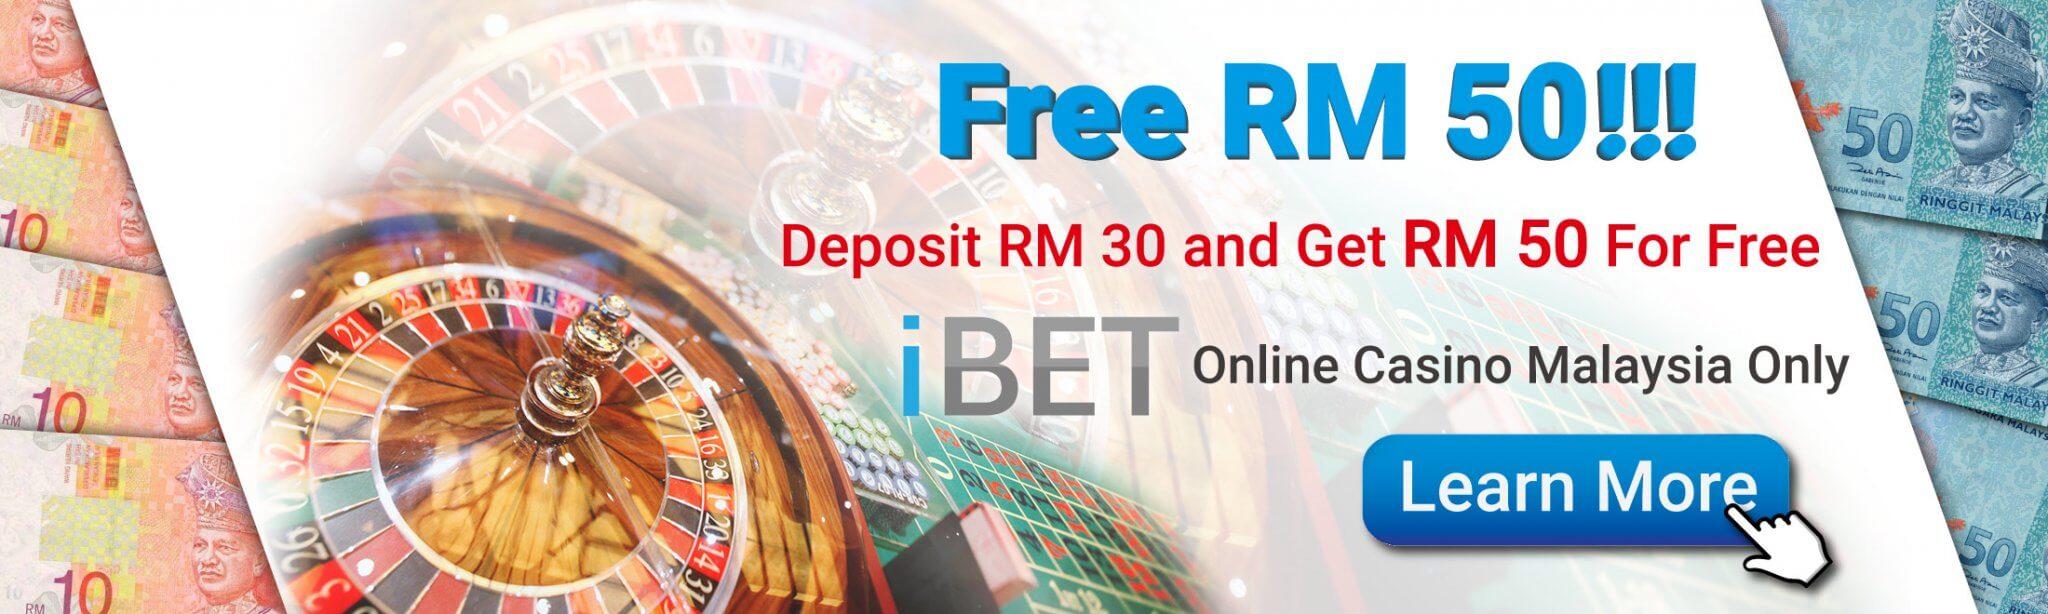 SCR888 Login Casino Deposit RM30 Free RM50 in iBET Online Casino Malaysia